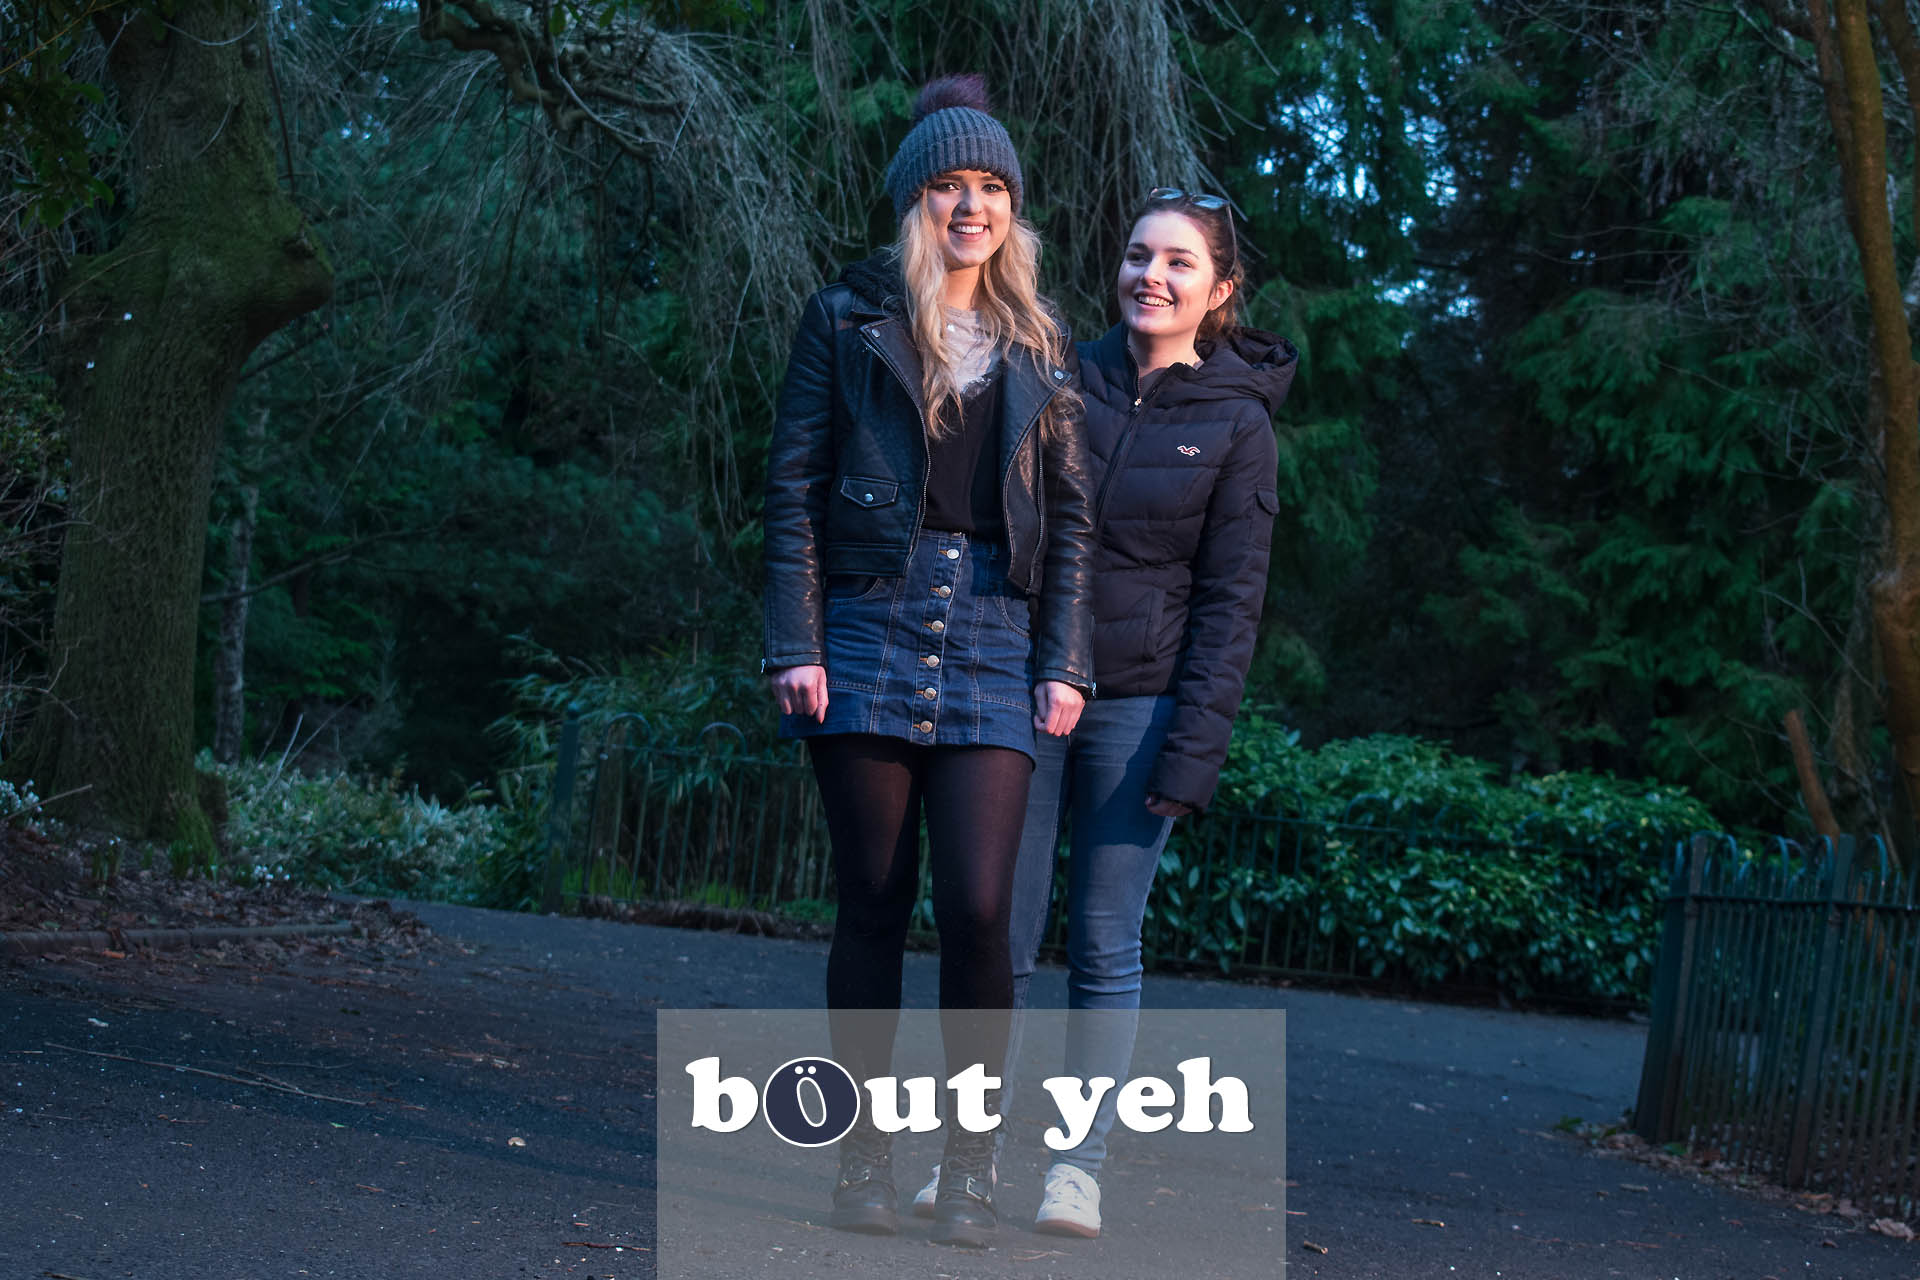 Student friends in Botanic Gardens, Belfast - photo 4346.